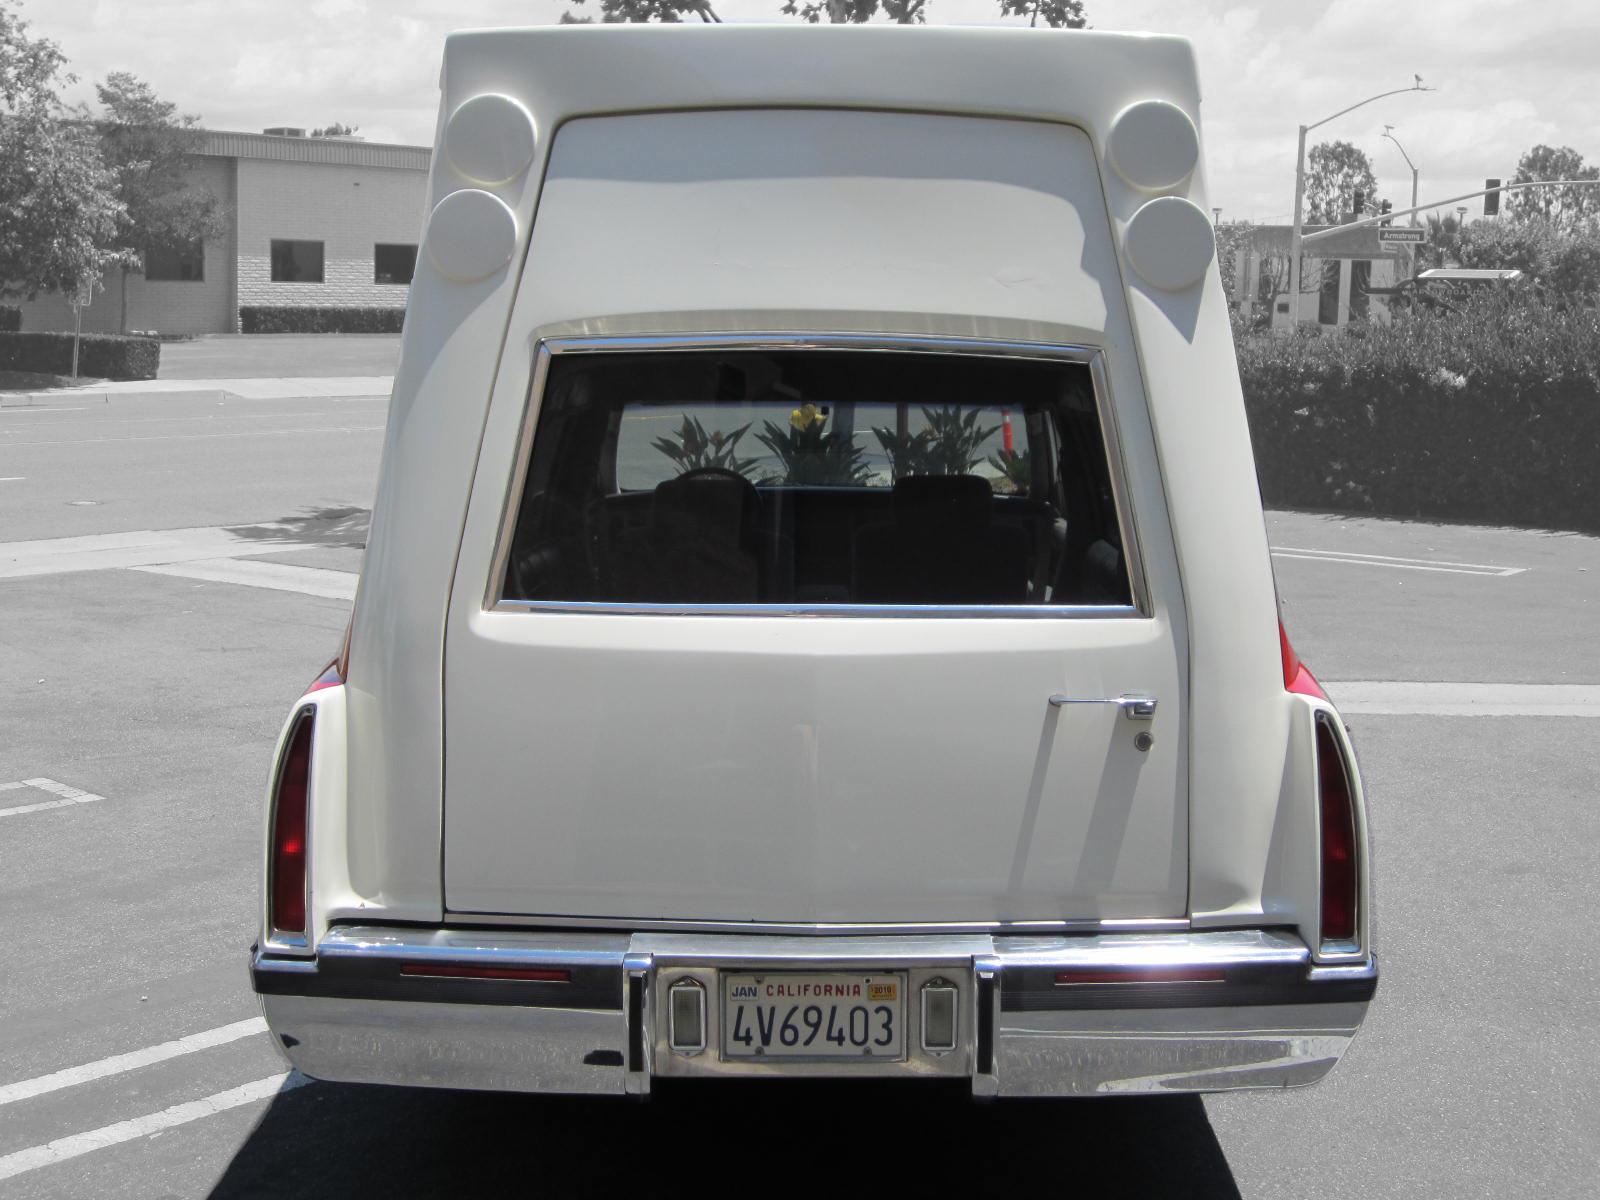 1993 Cadiilac Fleetwood Ambulance For Sale 003